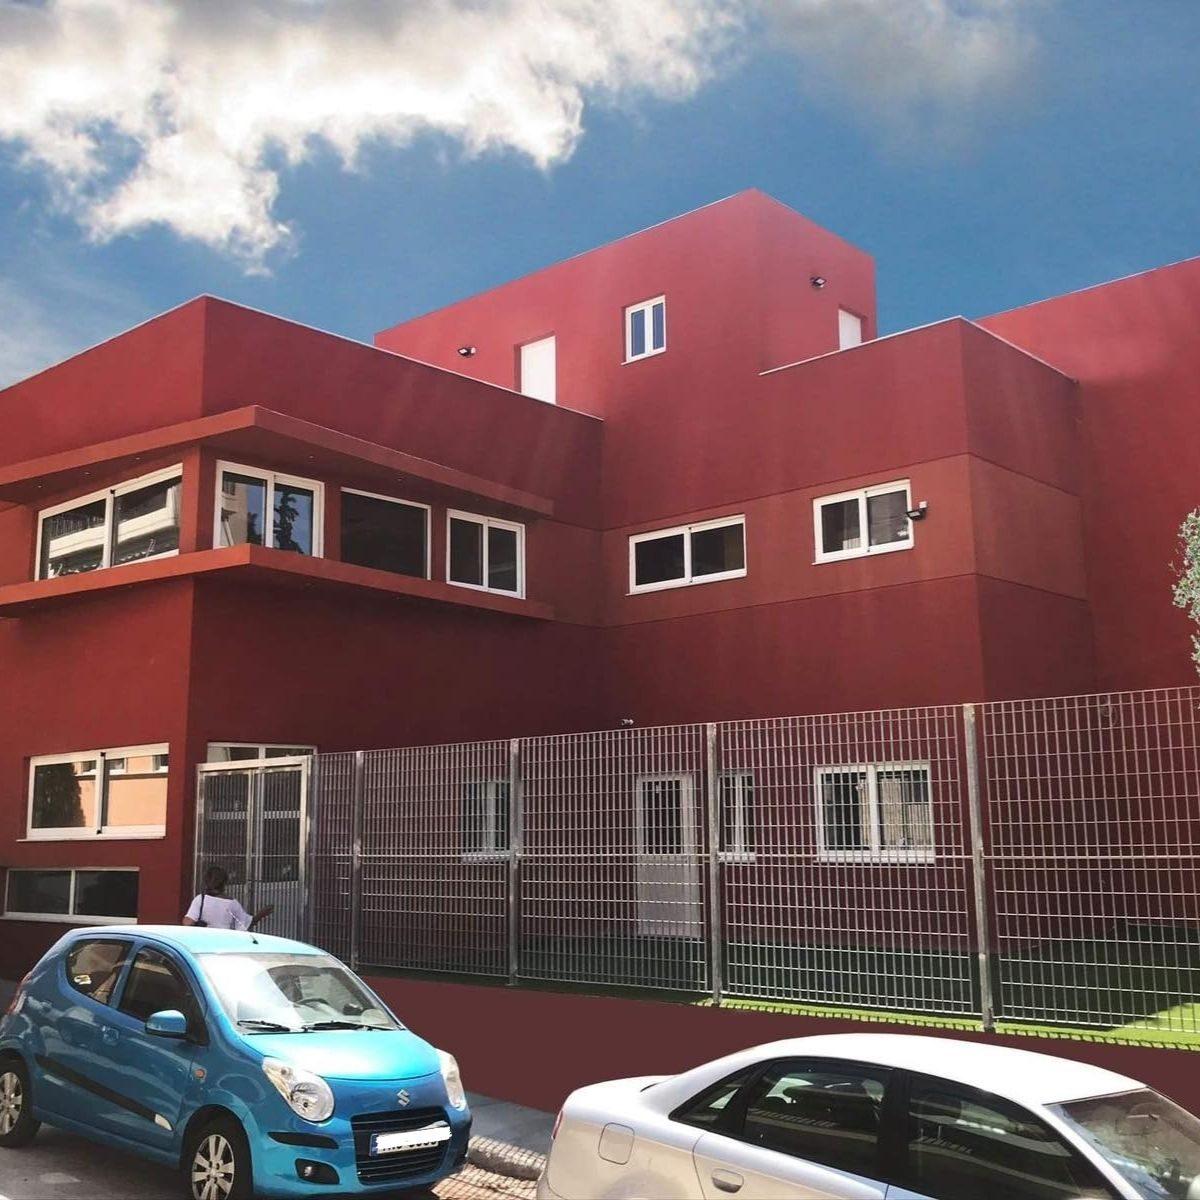 3D Σχεδιασμός Προκατασκευασμένων Κατοικιών